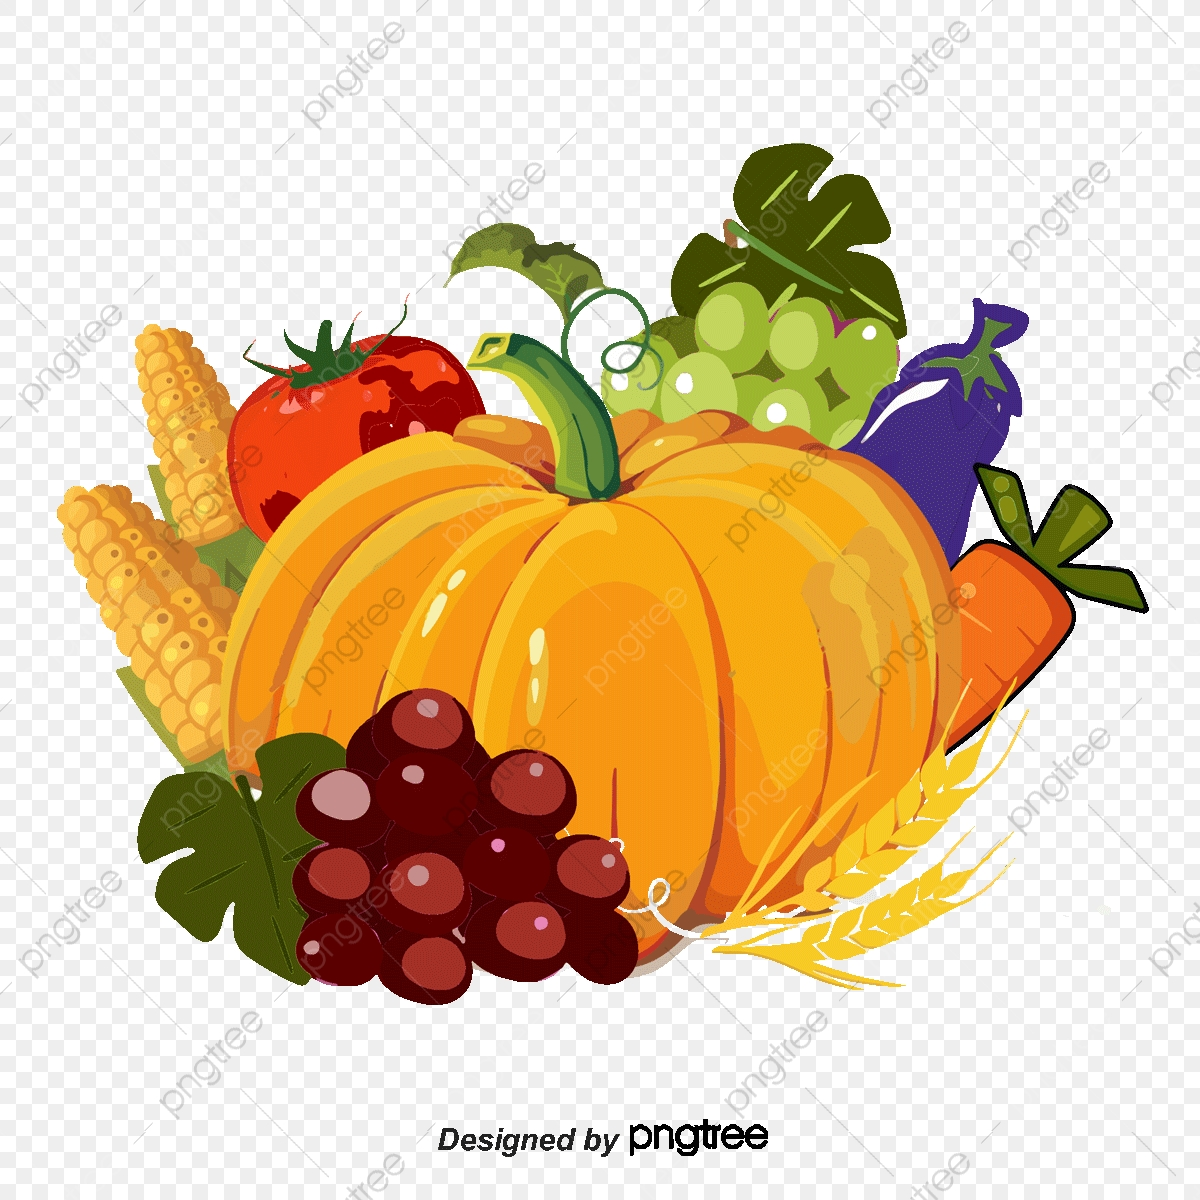 Fruits and vegetables food. Harvest clipart vegatable